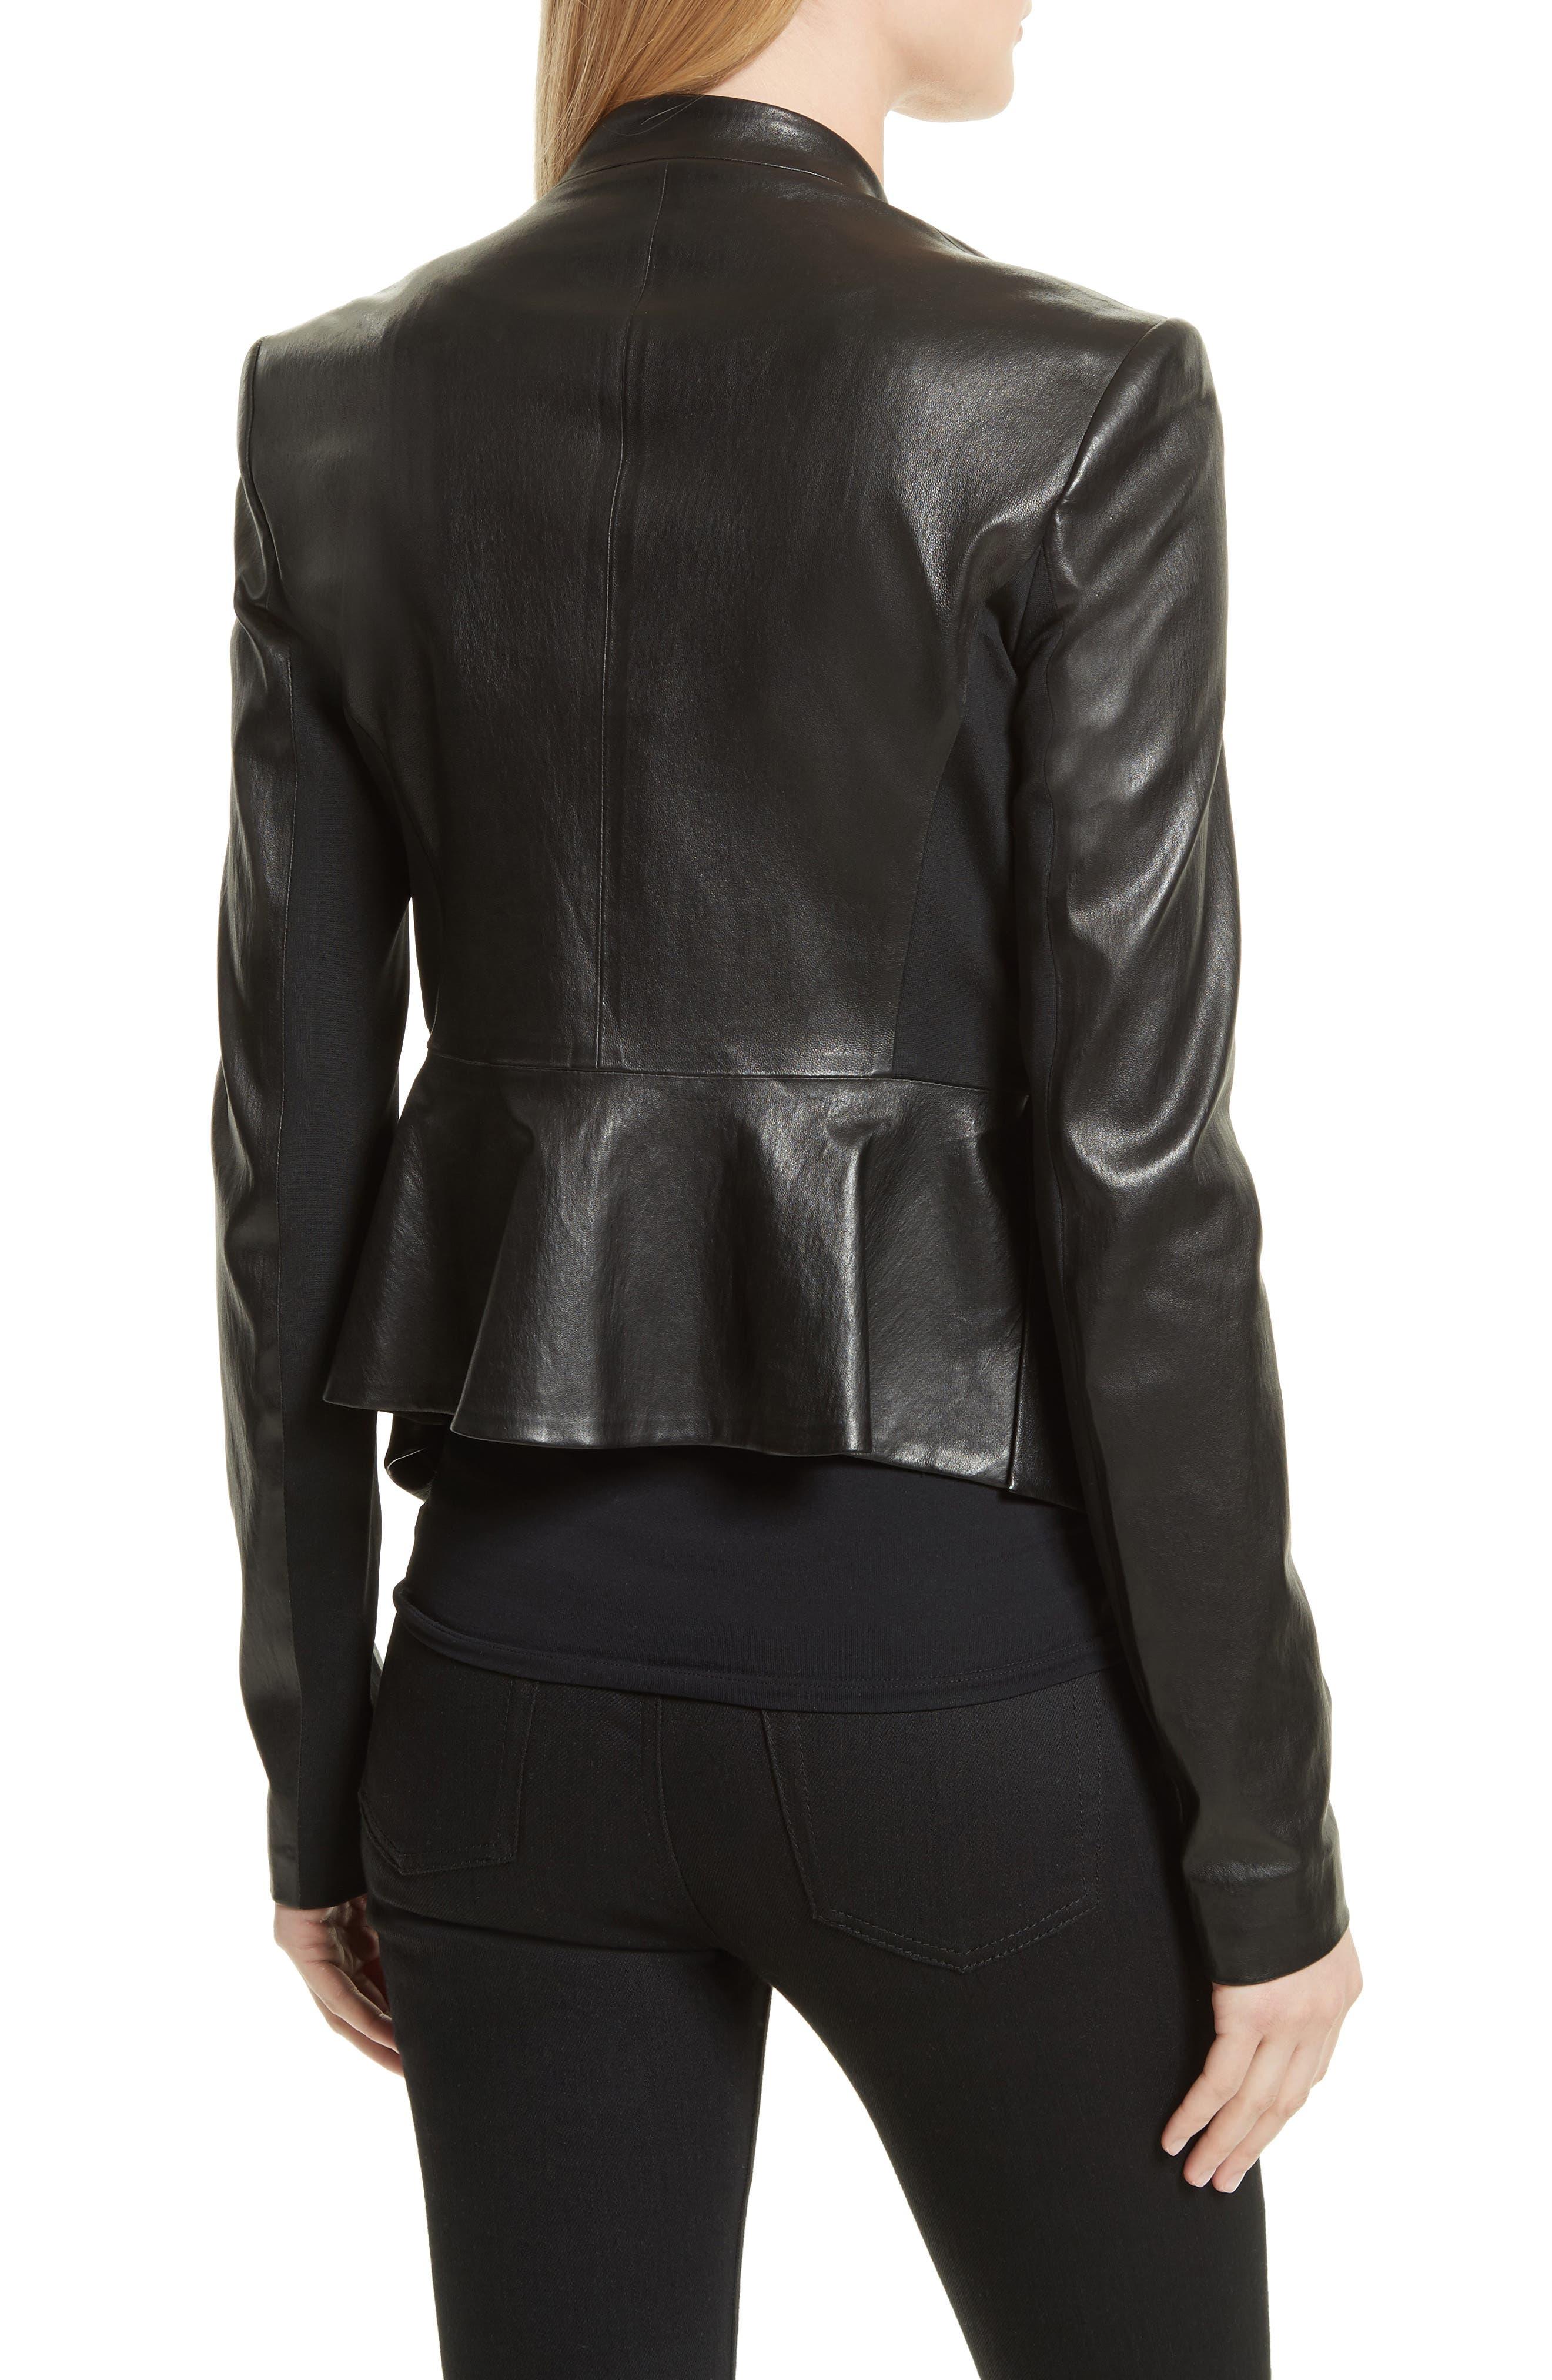 Bristol Peplum Leather Jacket,                             Alternate thumbnail 2, color,                             001